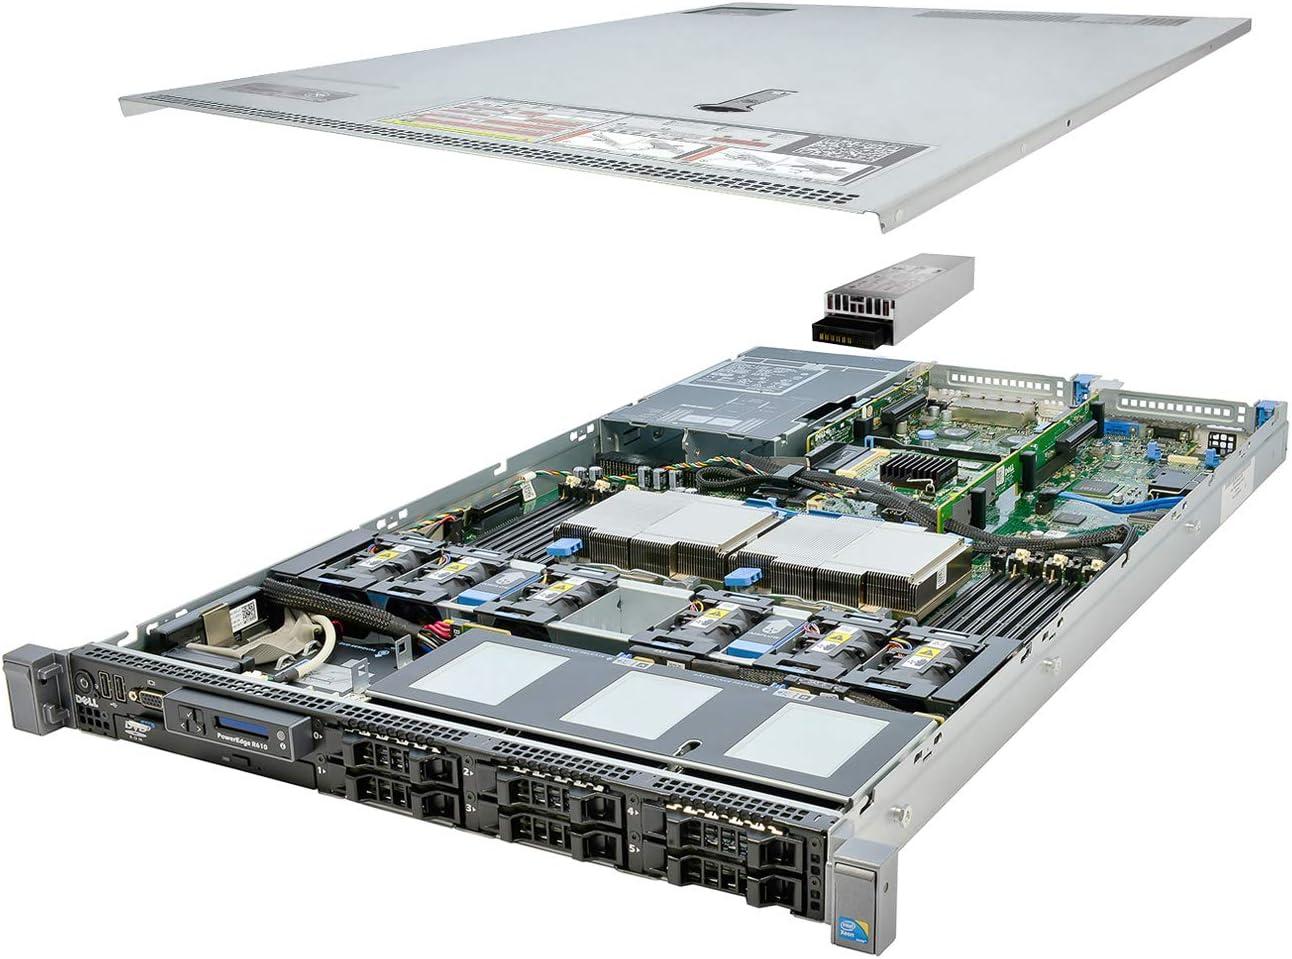 DELL PowerEdge R610 Server 2X 2.26Ghz L5520 QC 48GB Energy-Efficient (Renewed)